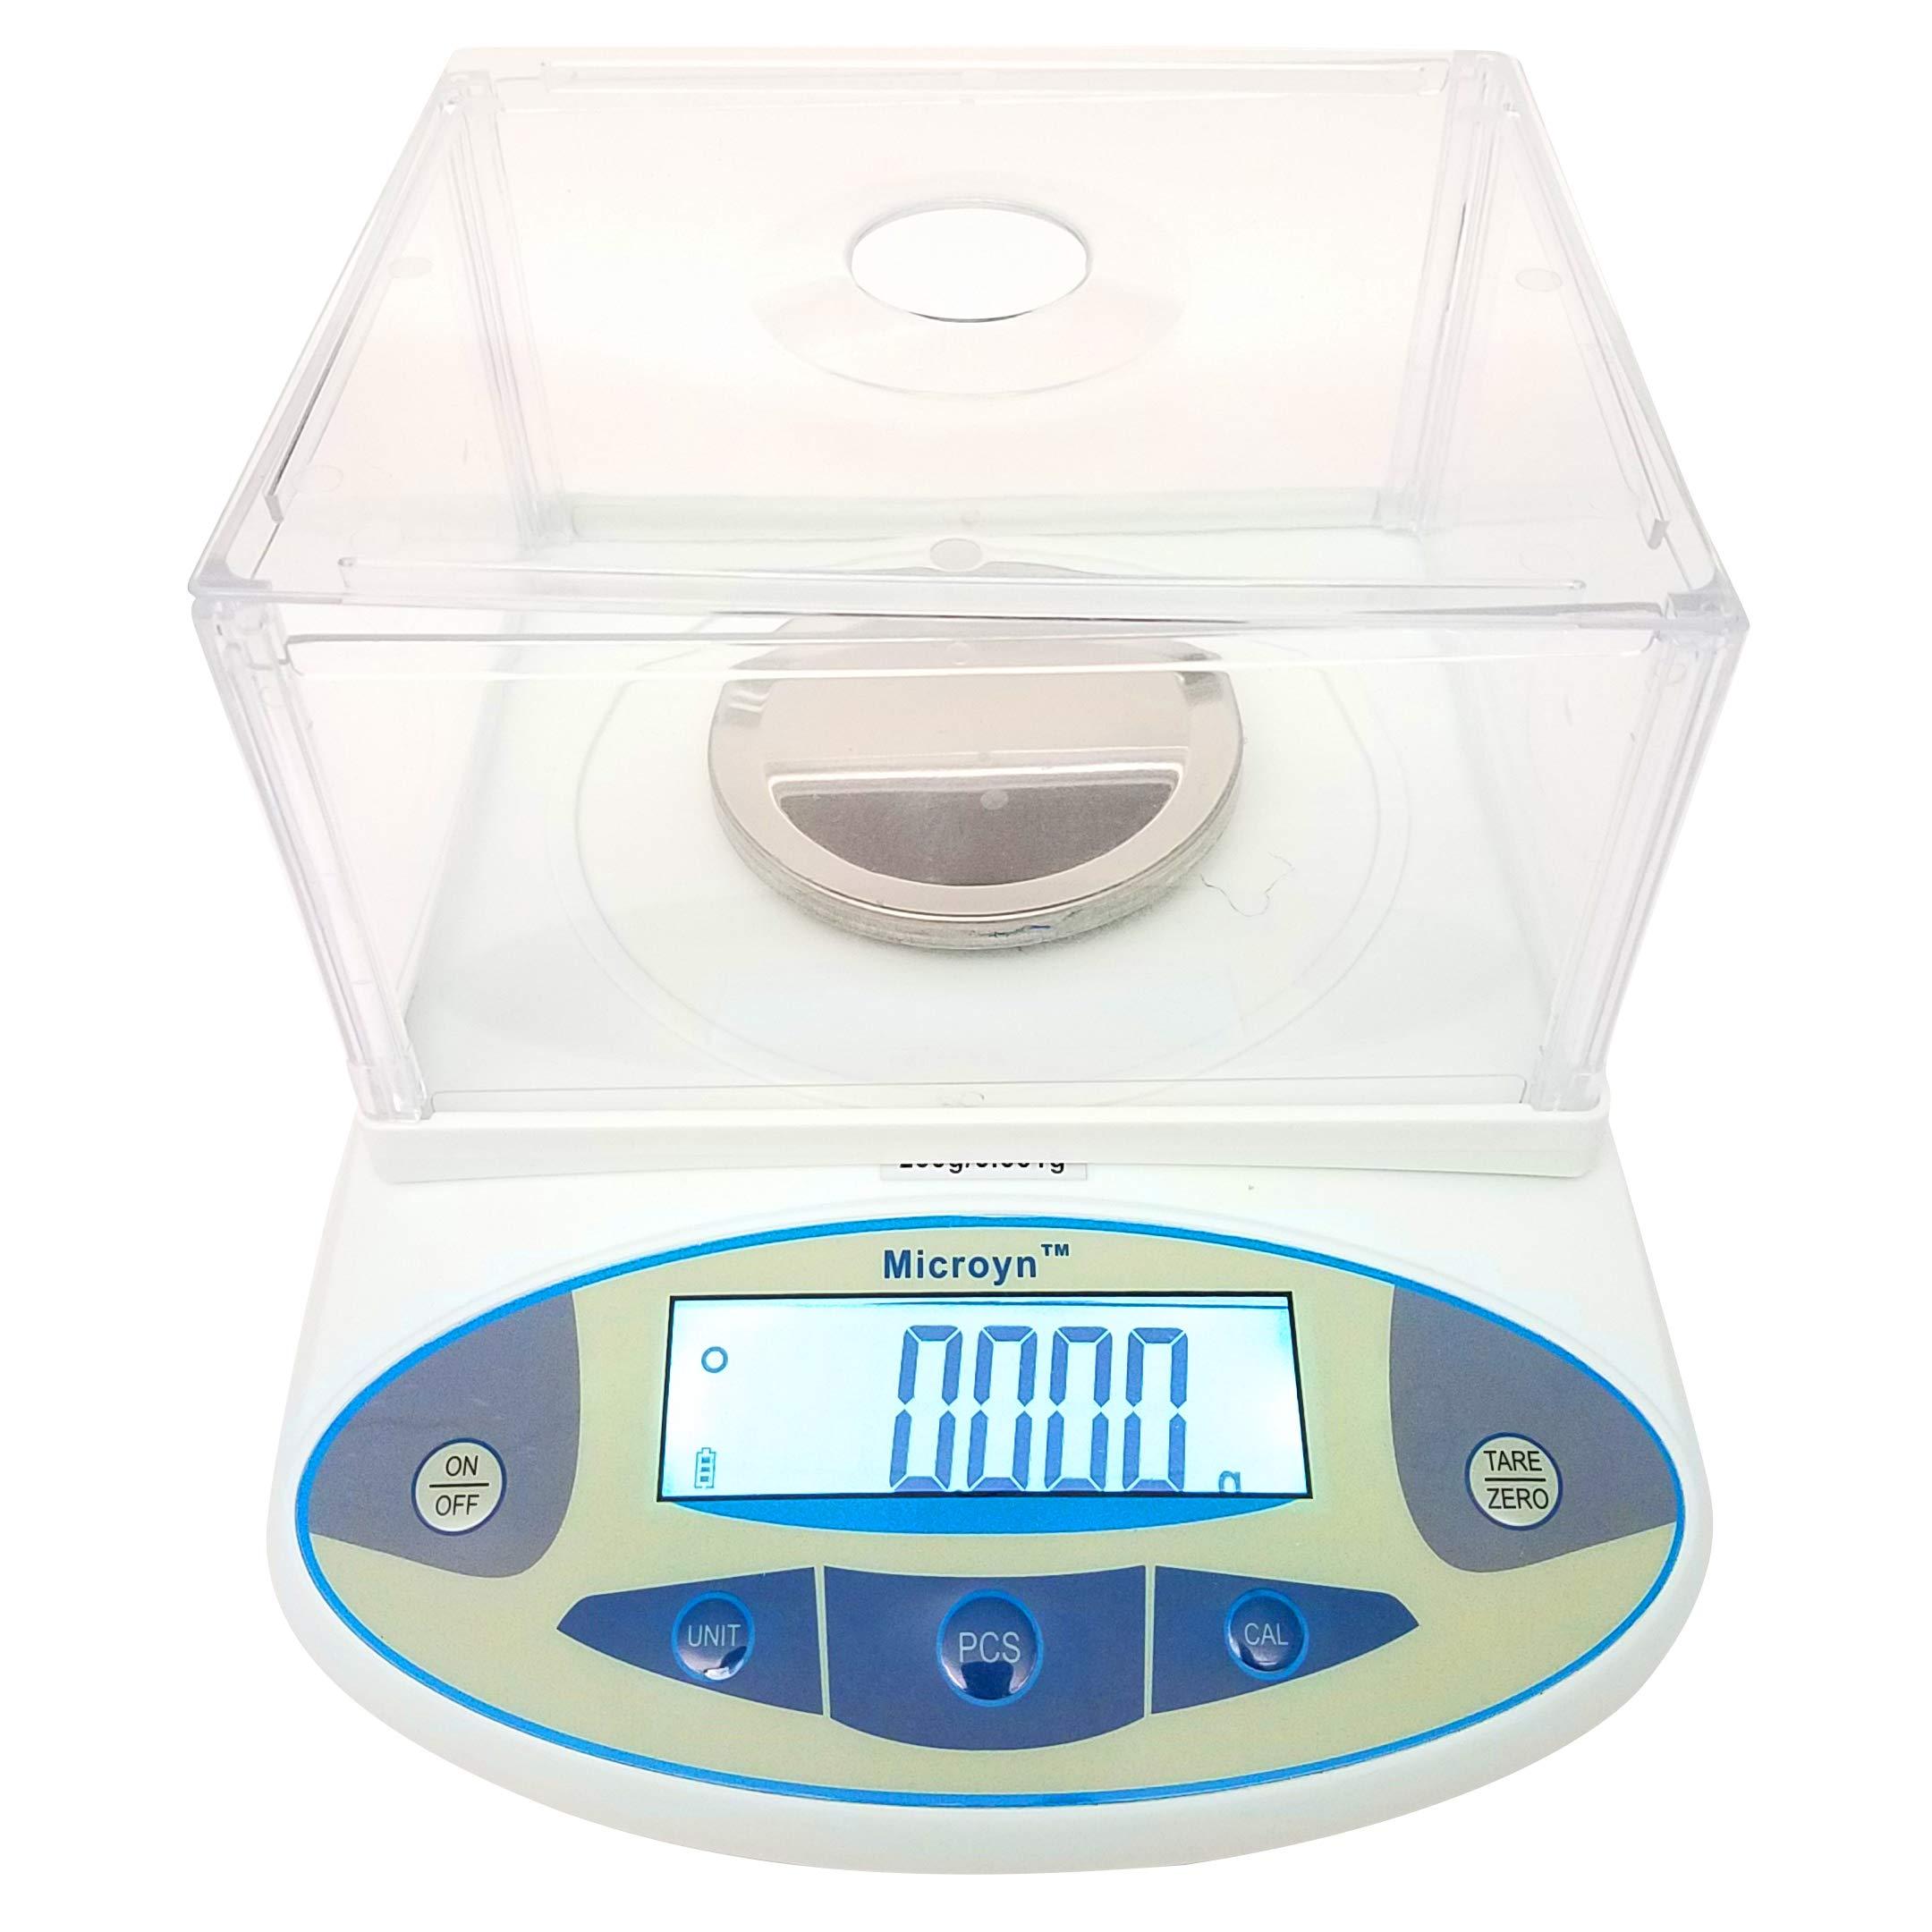 1mg Digital Analytical Balance Electronic Scale Precision Lab Balance, 200X0.001g